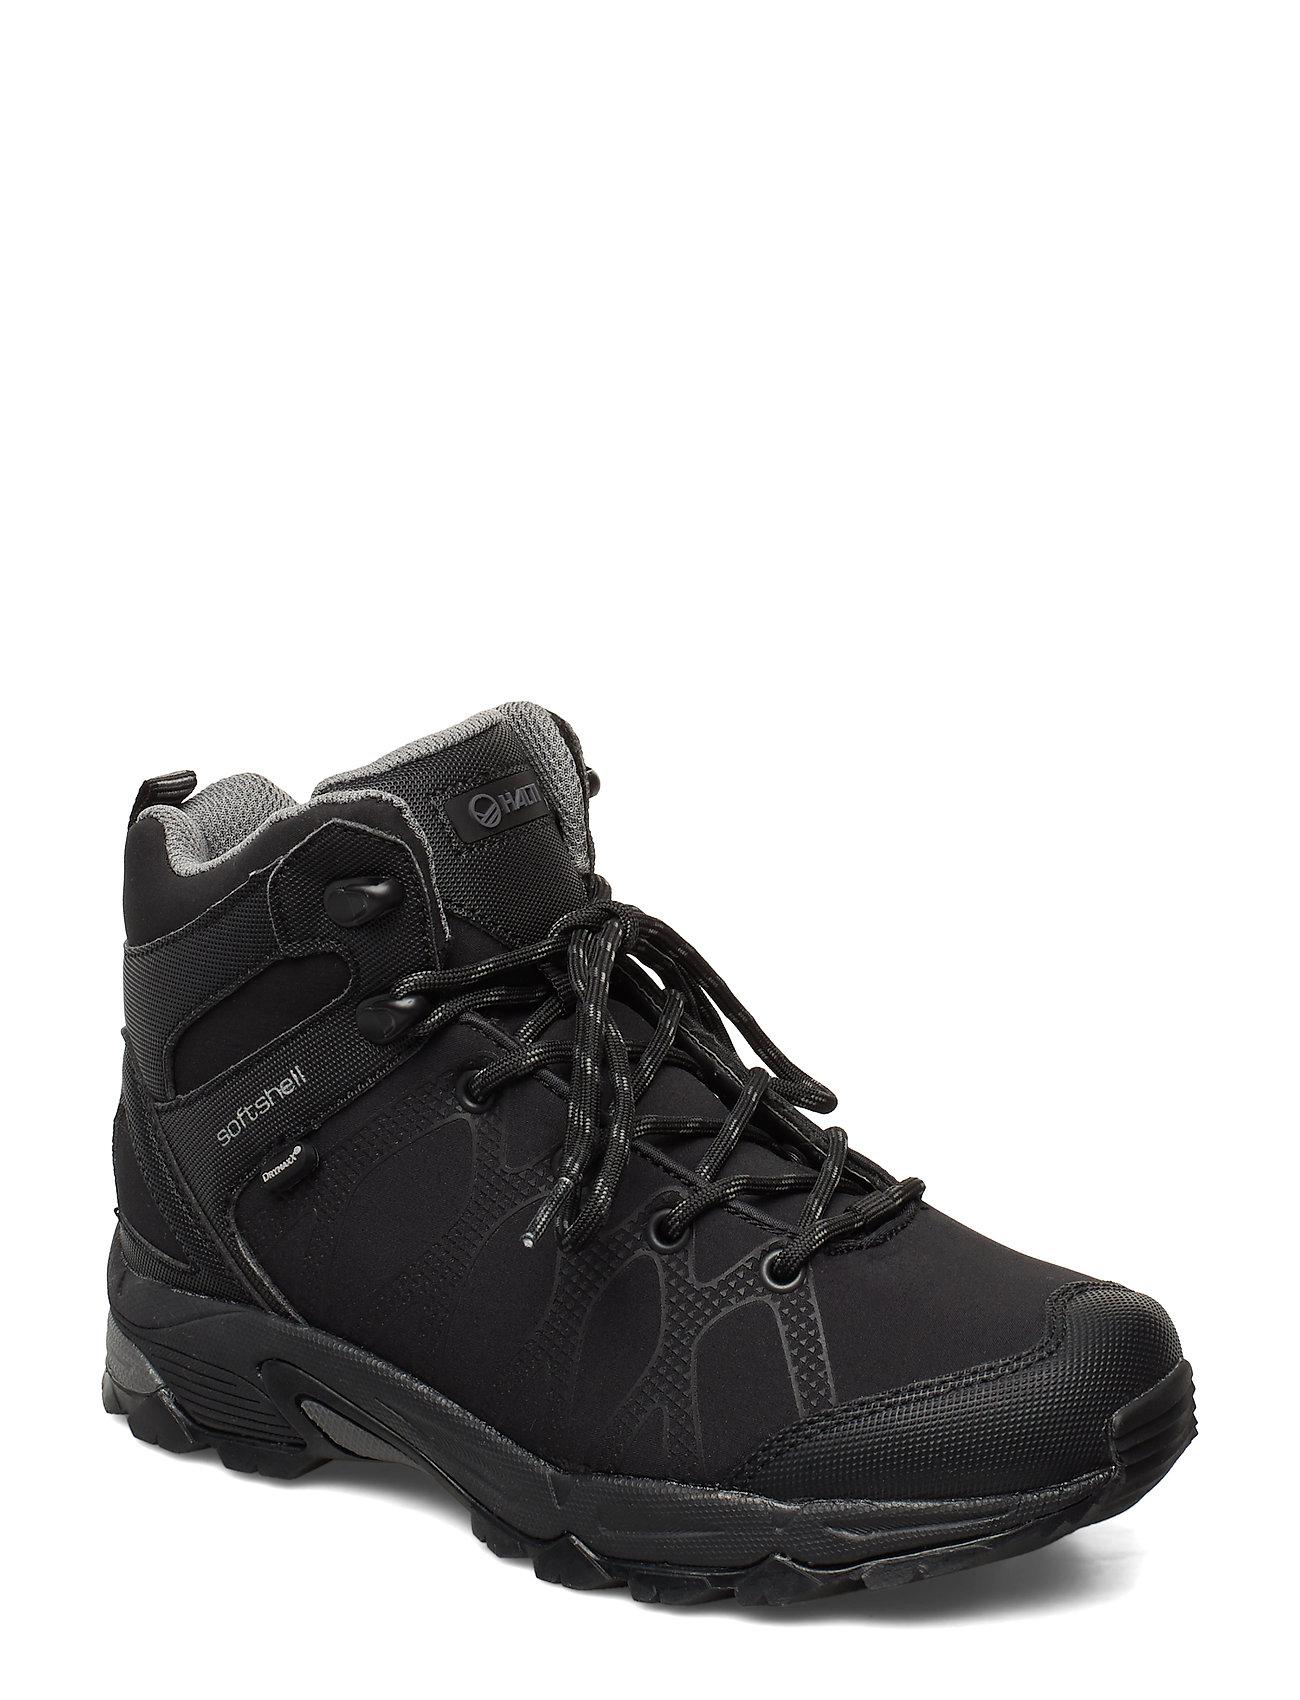 Image of M Mid Dx W Trekking Shoe Shoes Sport Shoes Training Shoes- Golf/tennis/fitness Sort Halti (3285596331)